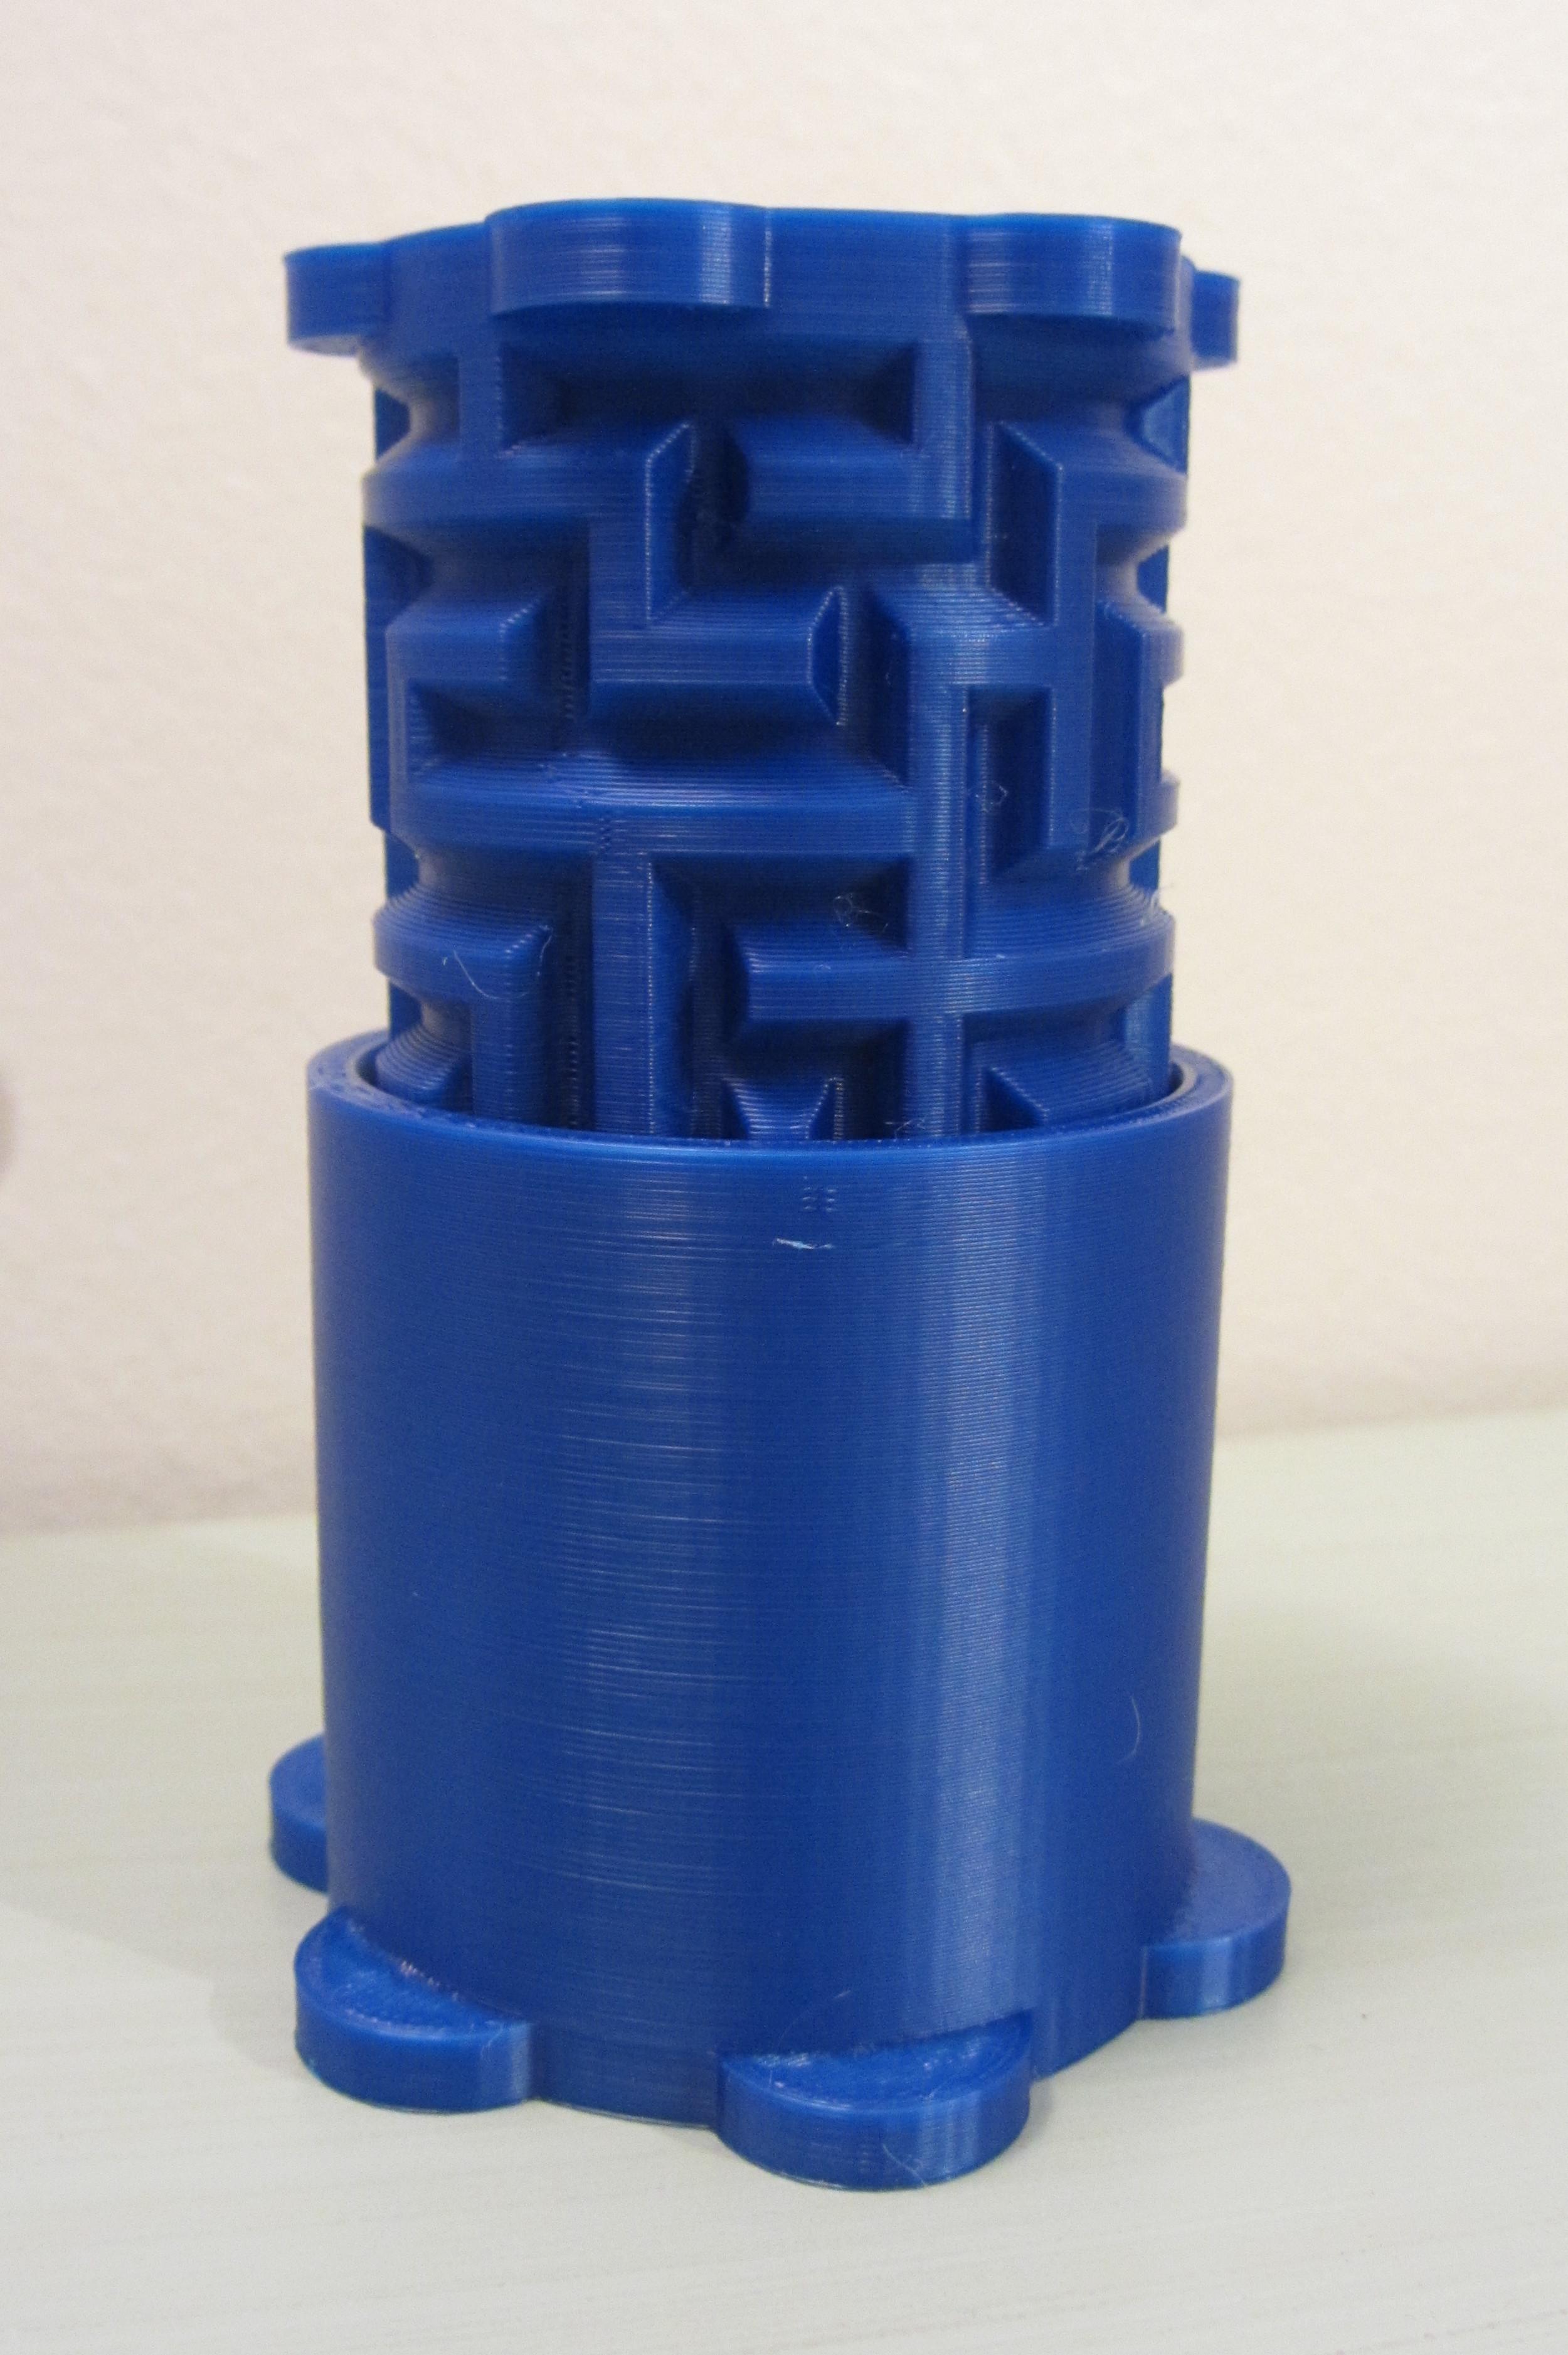 Maze Cylinder Box   Makergear M2 - 0.2mm layers - Blue PLA